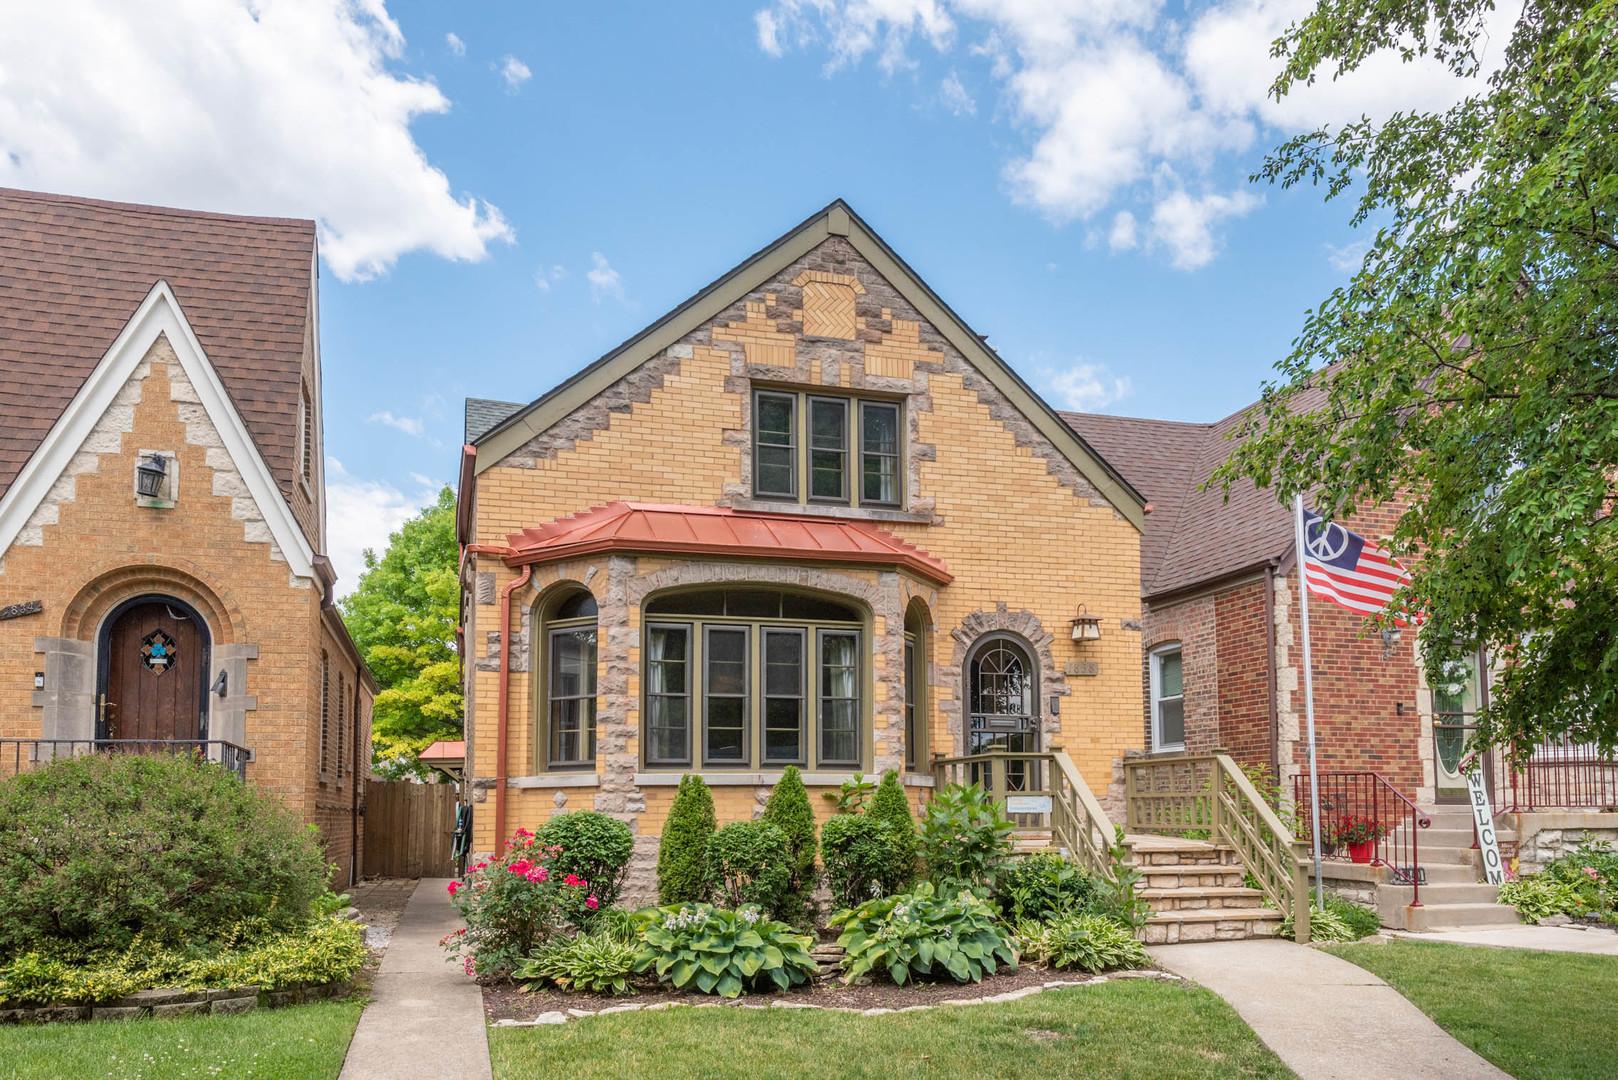 1838 N Sayre Avenue, Chicago IL 60707